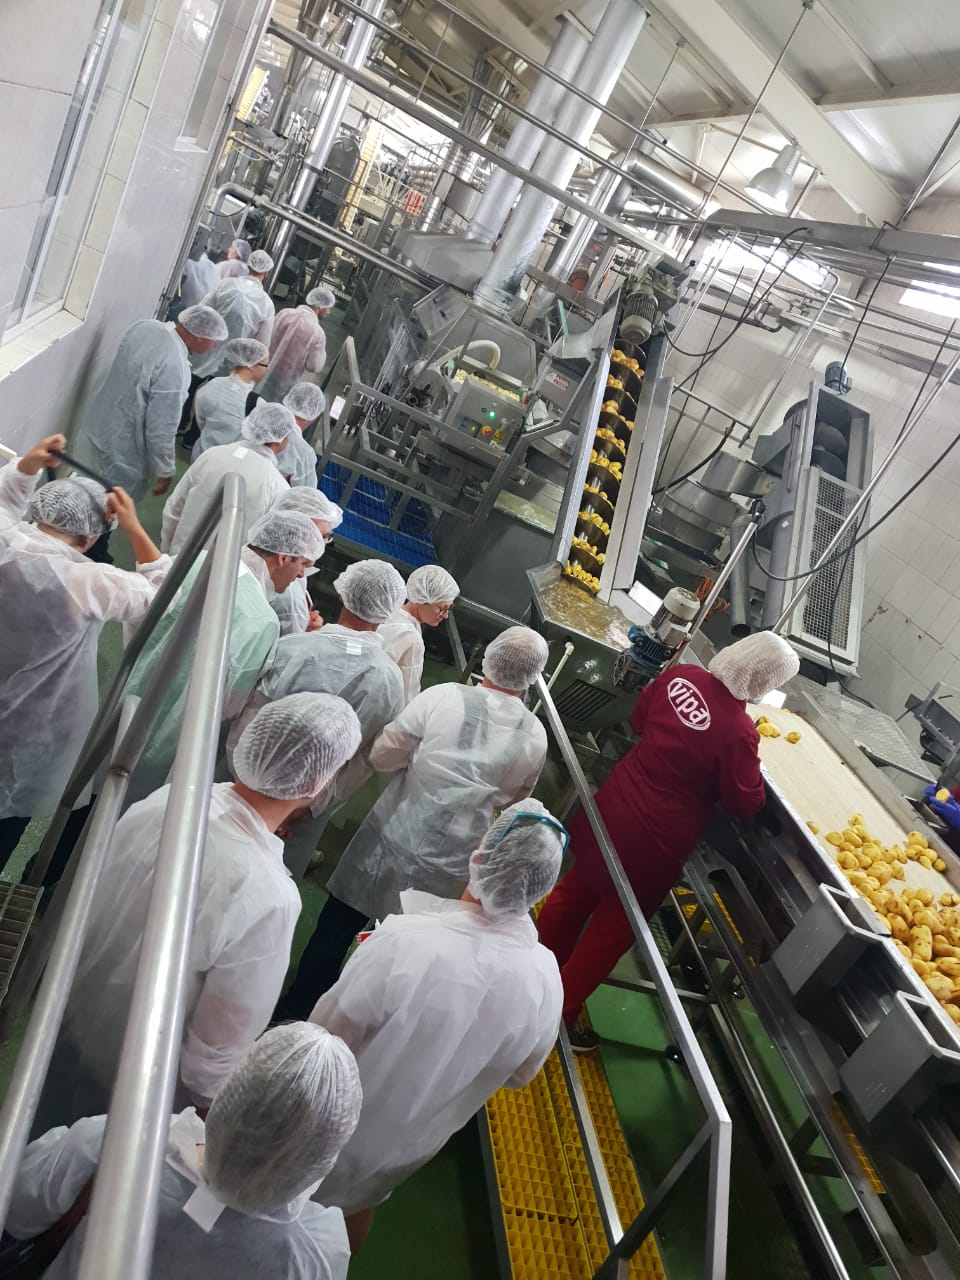 balkandestination business trip factory vipachips kosovo